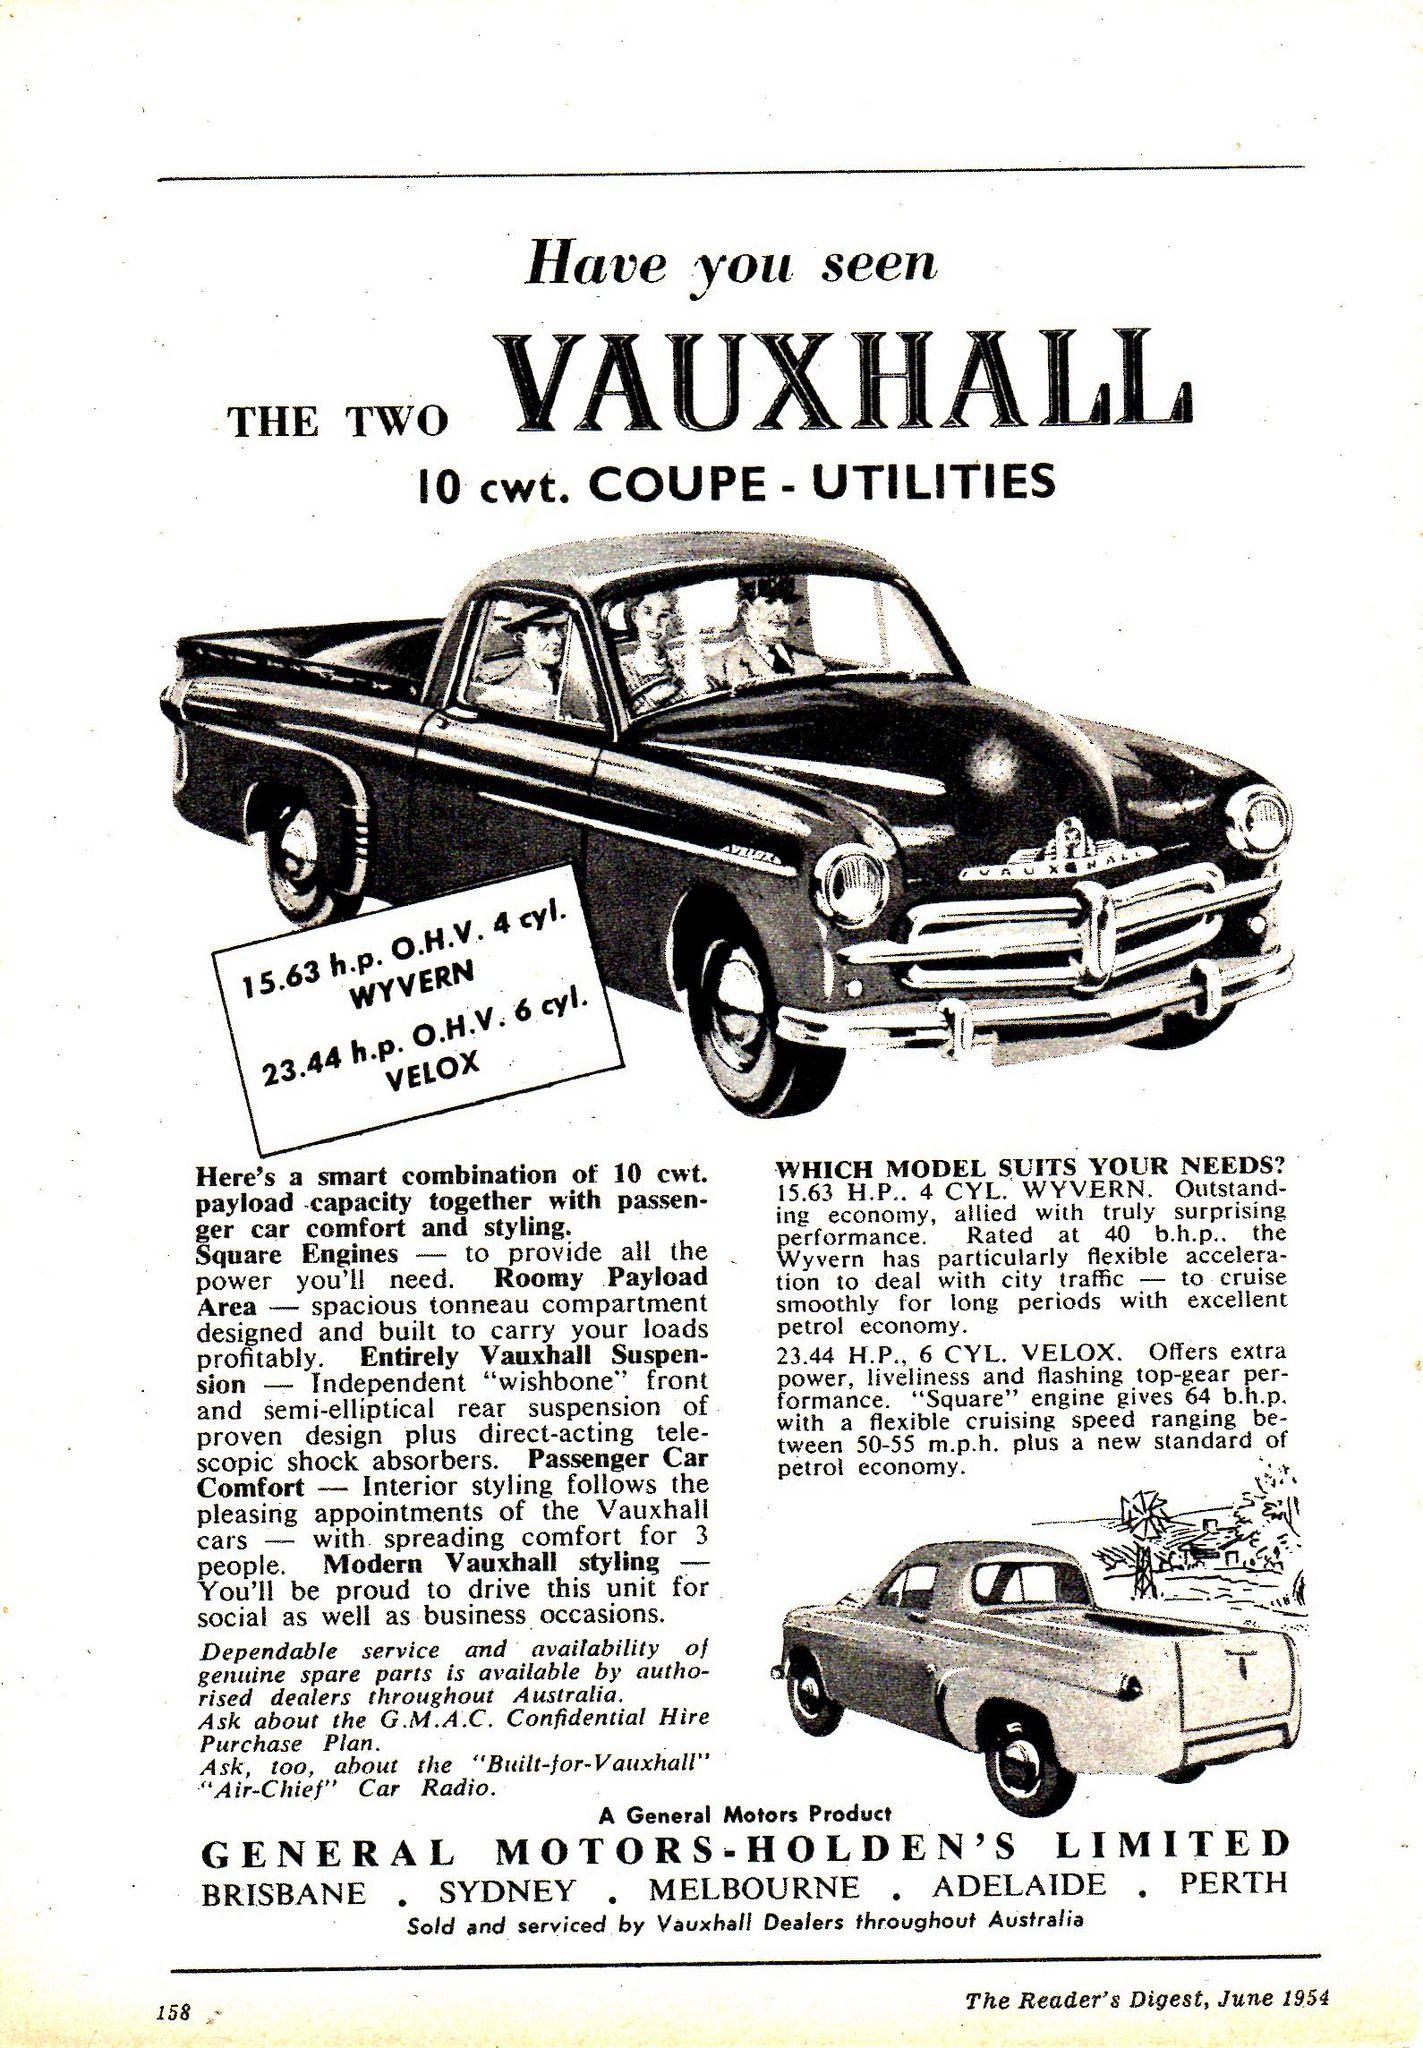 1954 Vauxhall Velox Wyvern 10 Cwt Coupe Utilities Aussie Original Magazine Advertisement Vauxhall Commercial Vehicle Australian Cars